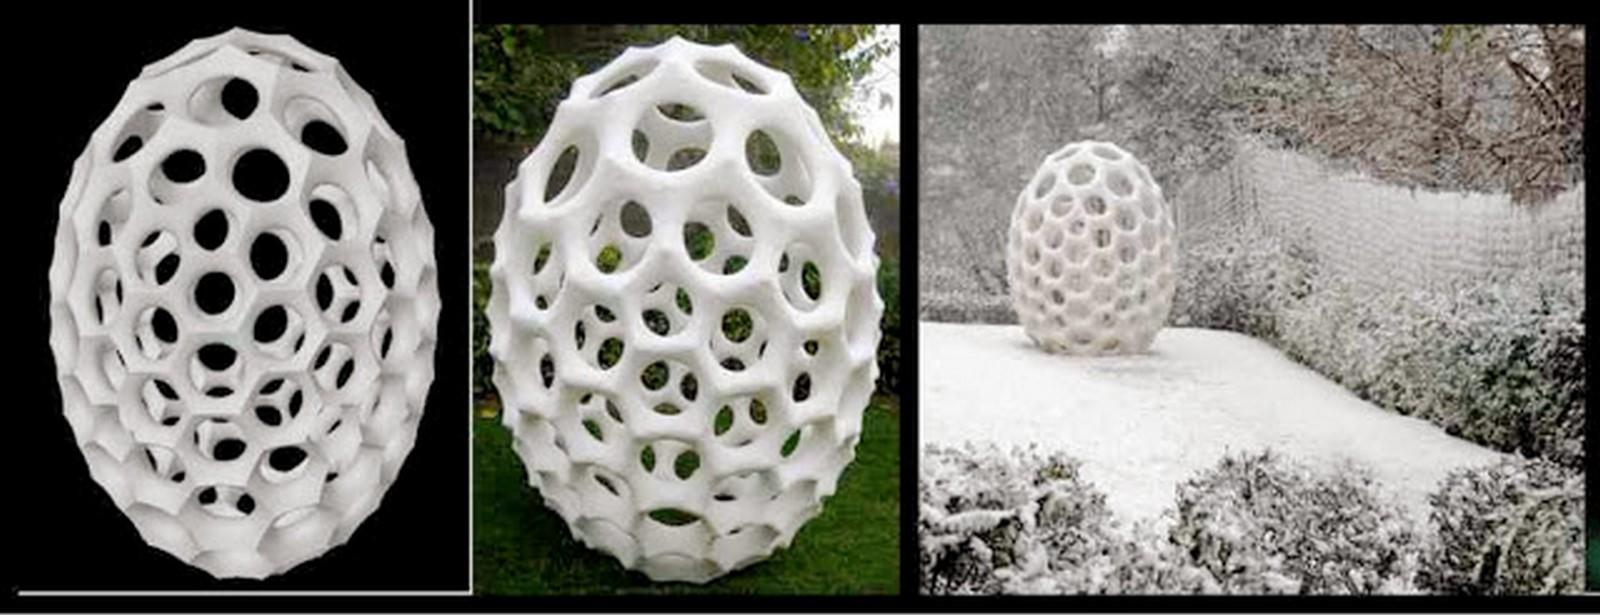 The Future of Architecture: Biodigital Architecture and Genetics - Sheet6